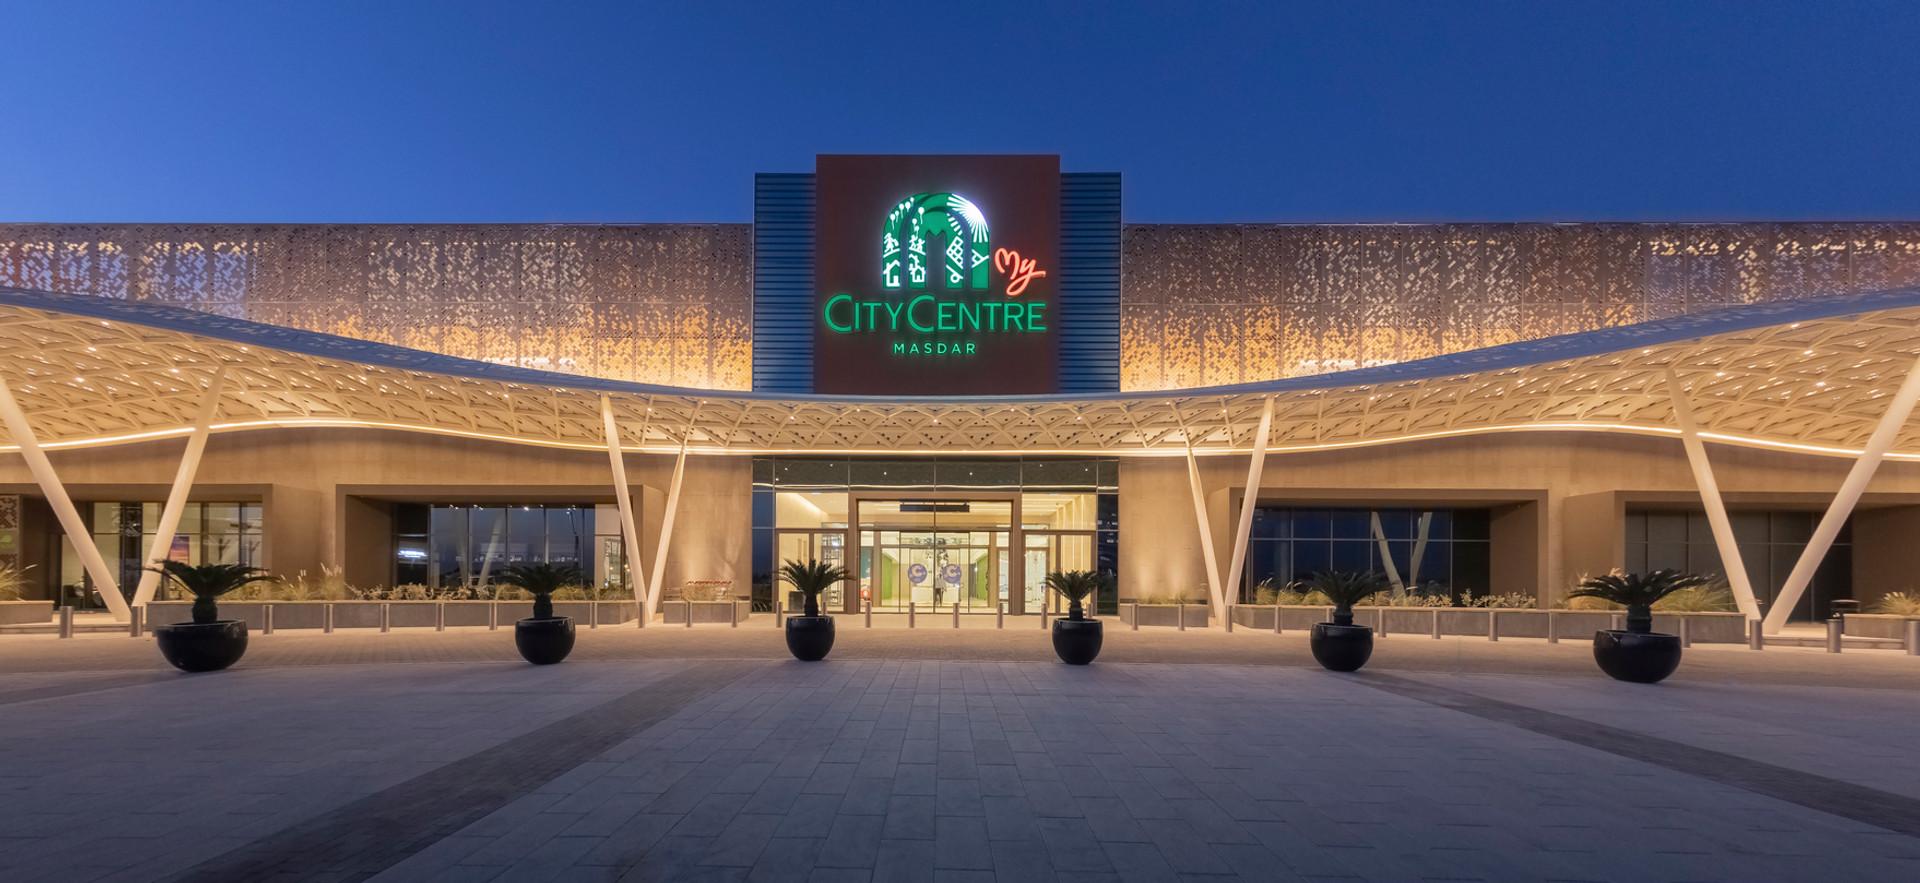 My City Center, Abu Dhabi, UAE